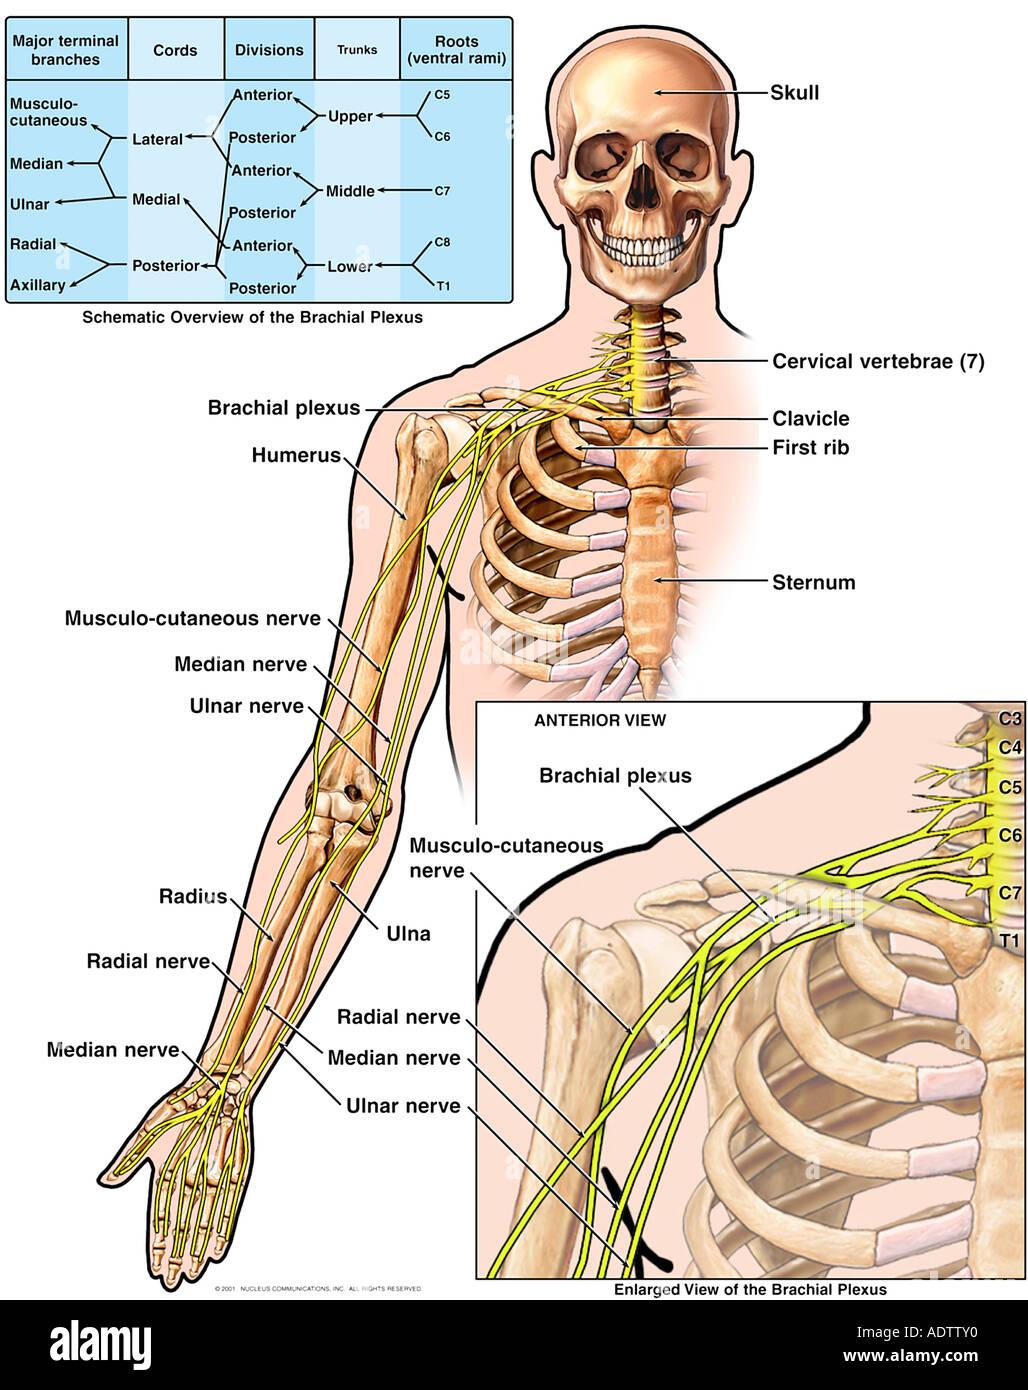 ulnar nerve diagram 2016 honda civic stereo wiring anatomy of the brachial plexus stock photo: 7710383 - alamy